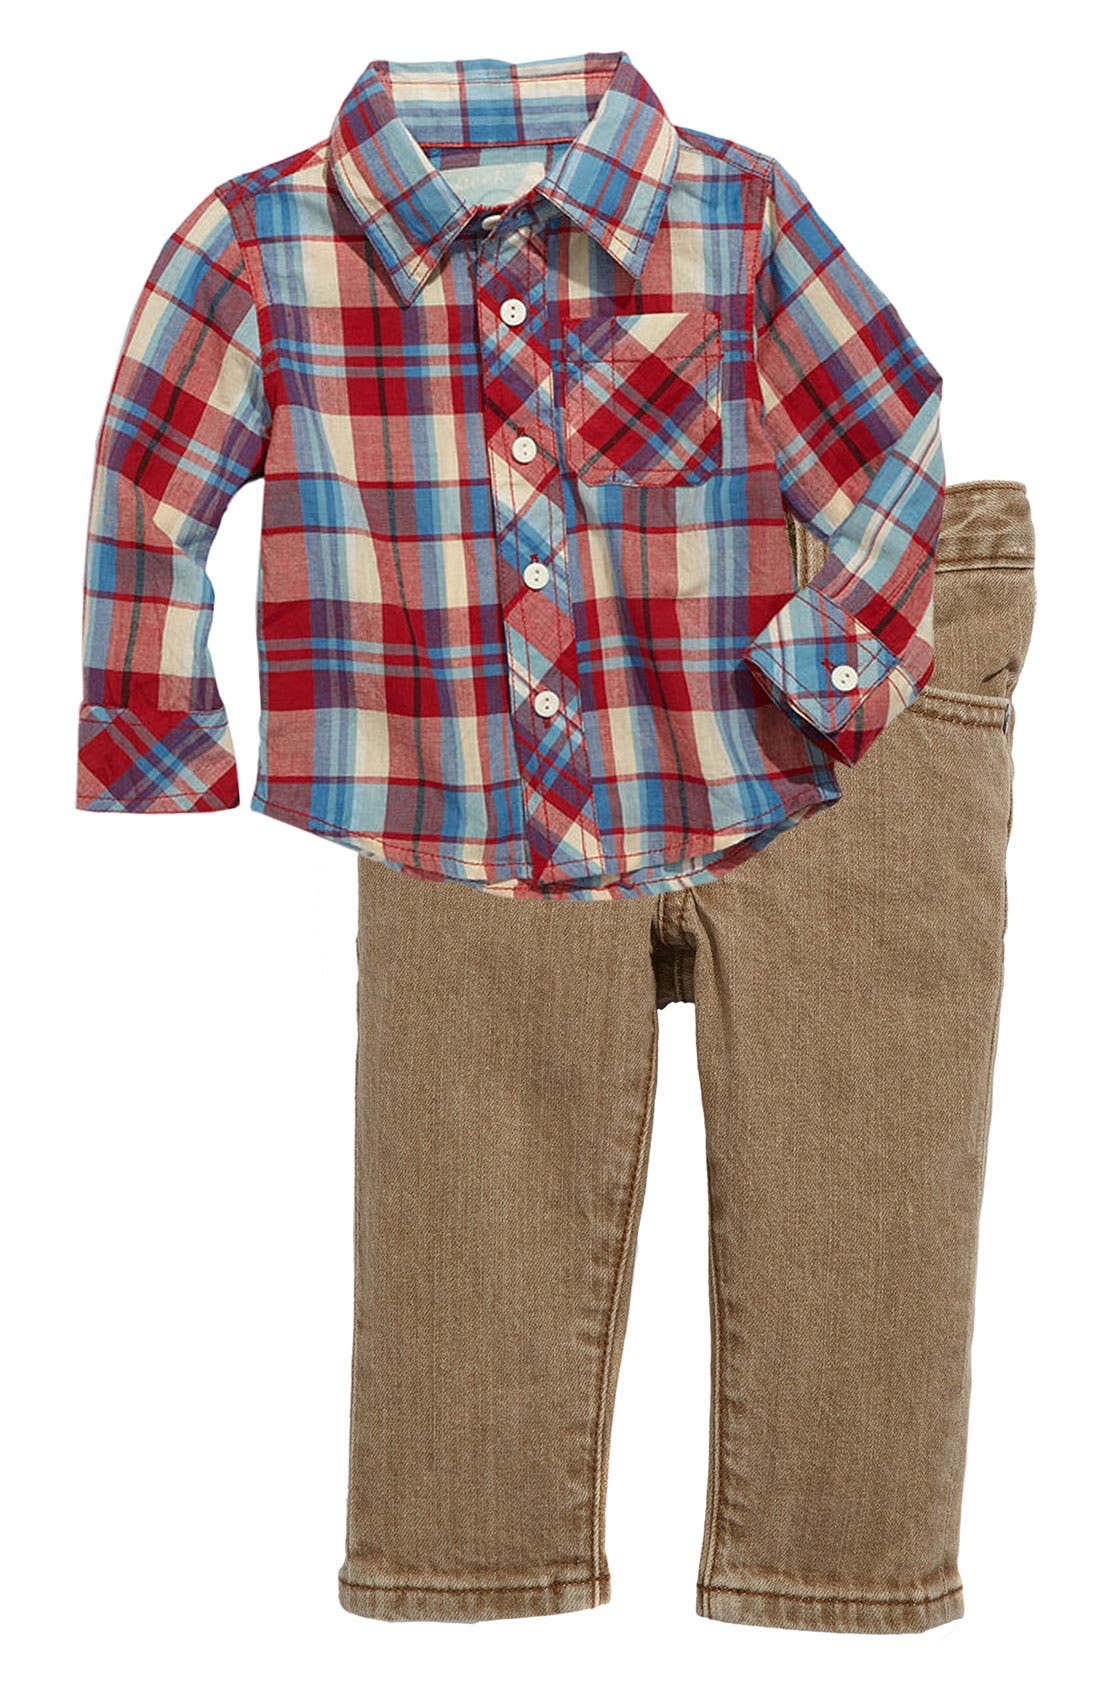 Main Image - Peek Plaid Shirt & Jeans (Infant)